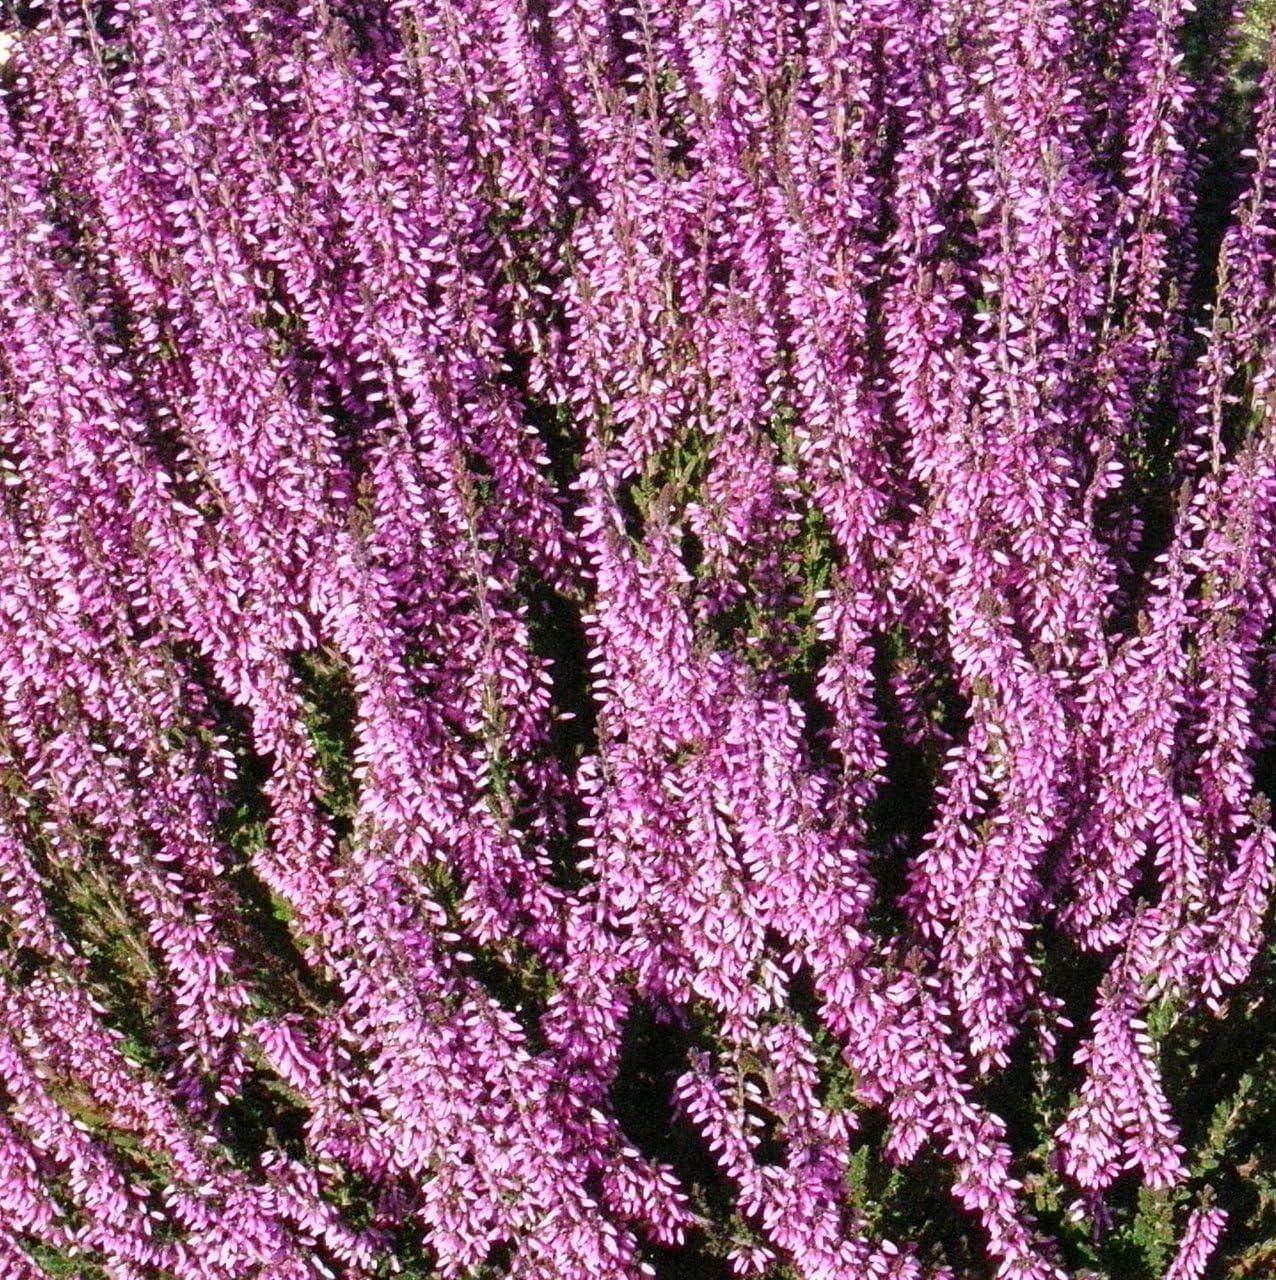 Cell grown VIVID PURPLE FLOWERS Calluna vulgaris Heather Shrub